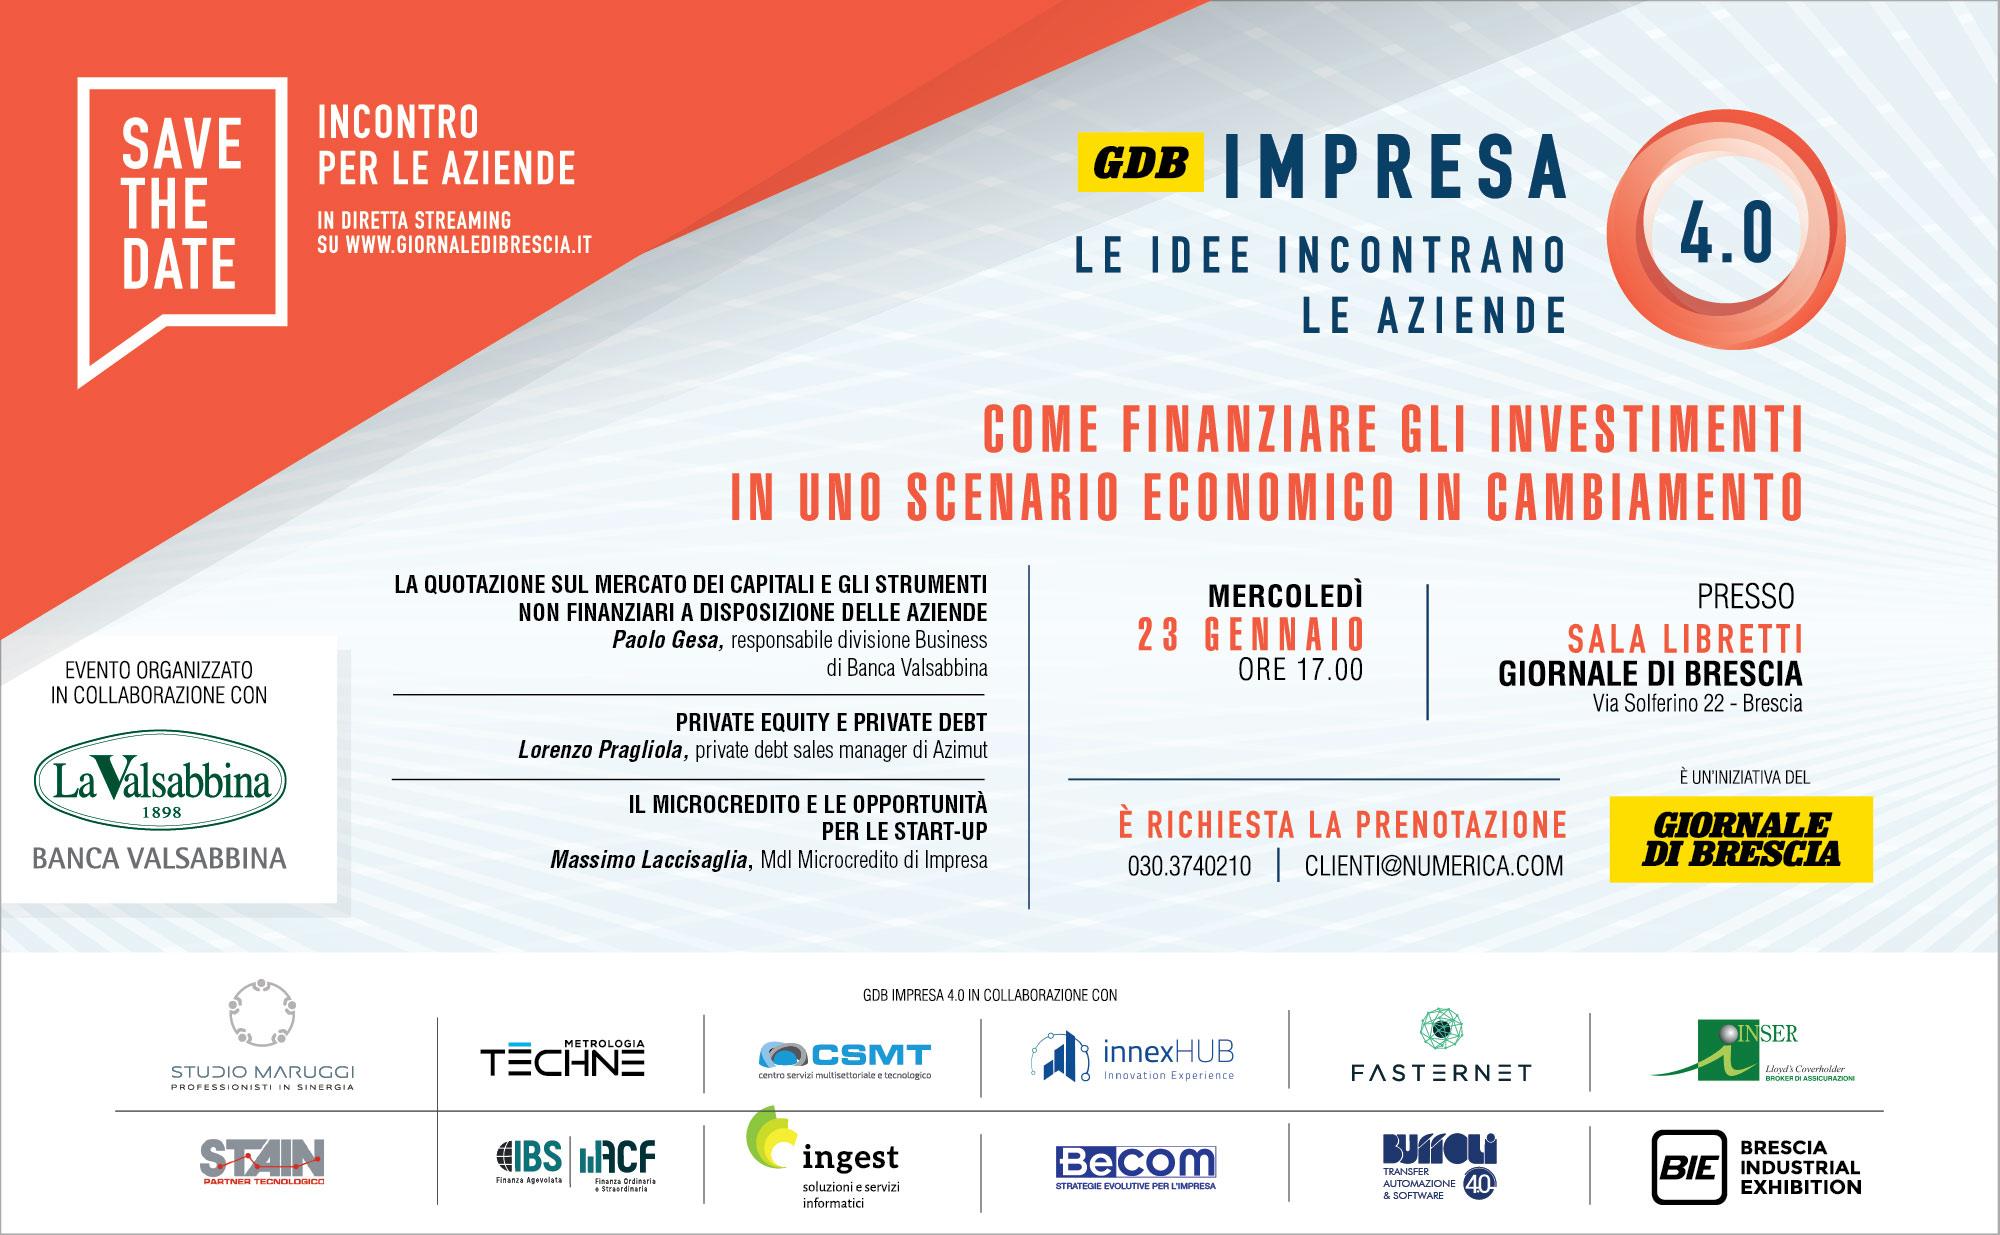 GdB Impresa 4.0 23 genn | Banca Valsabbina